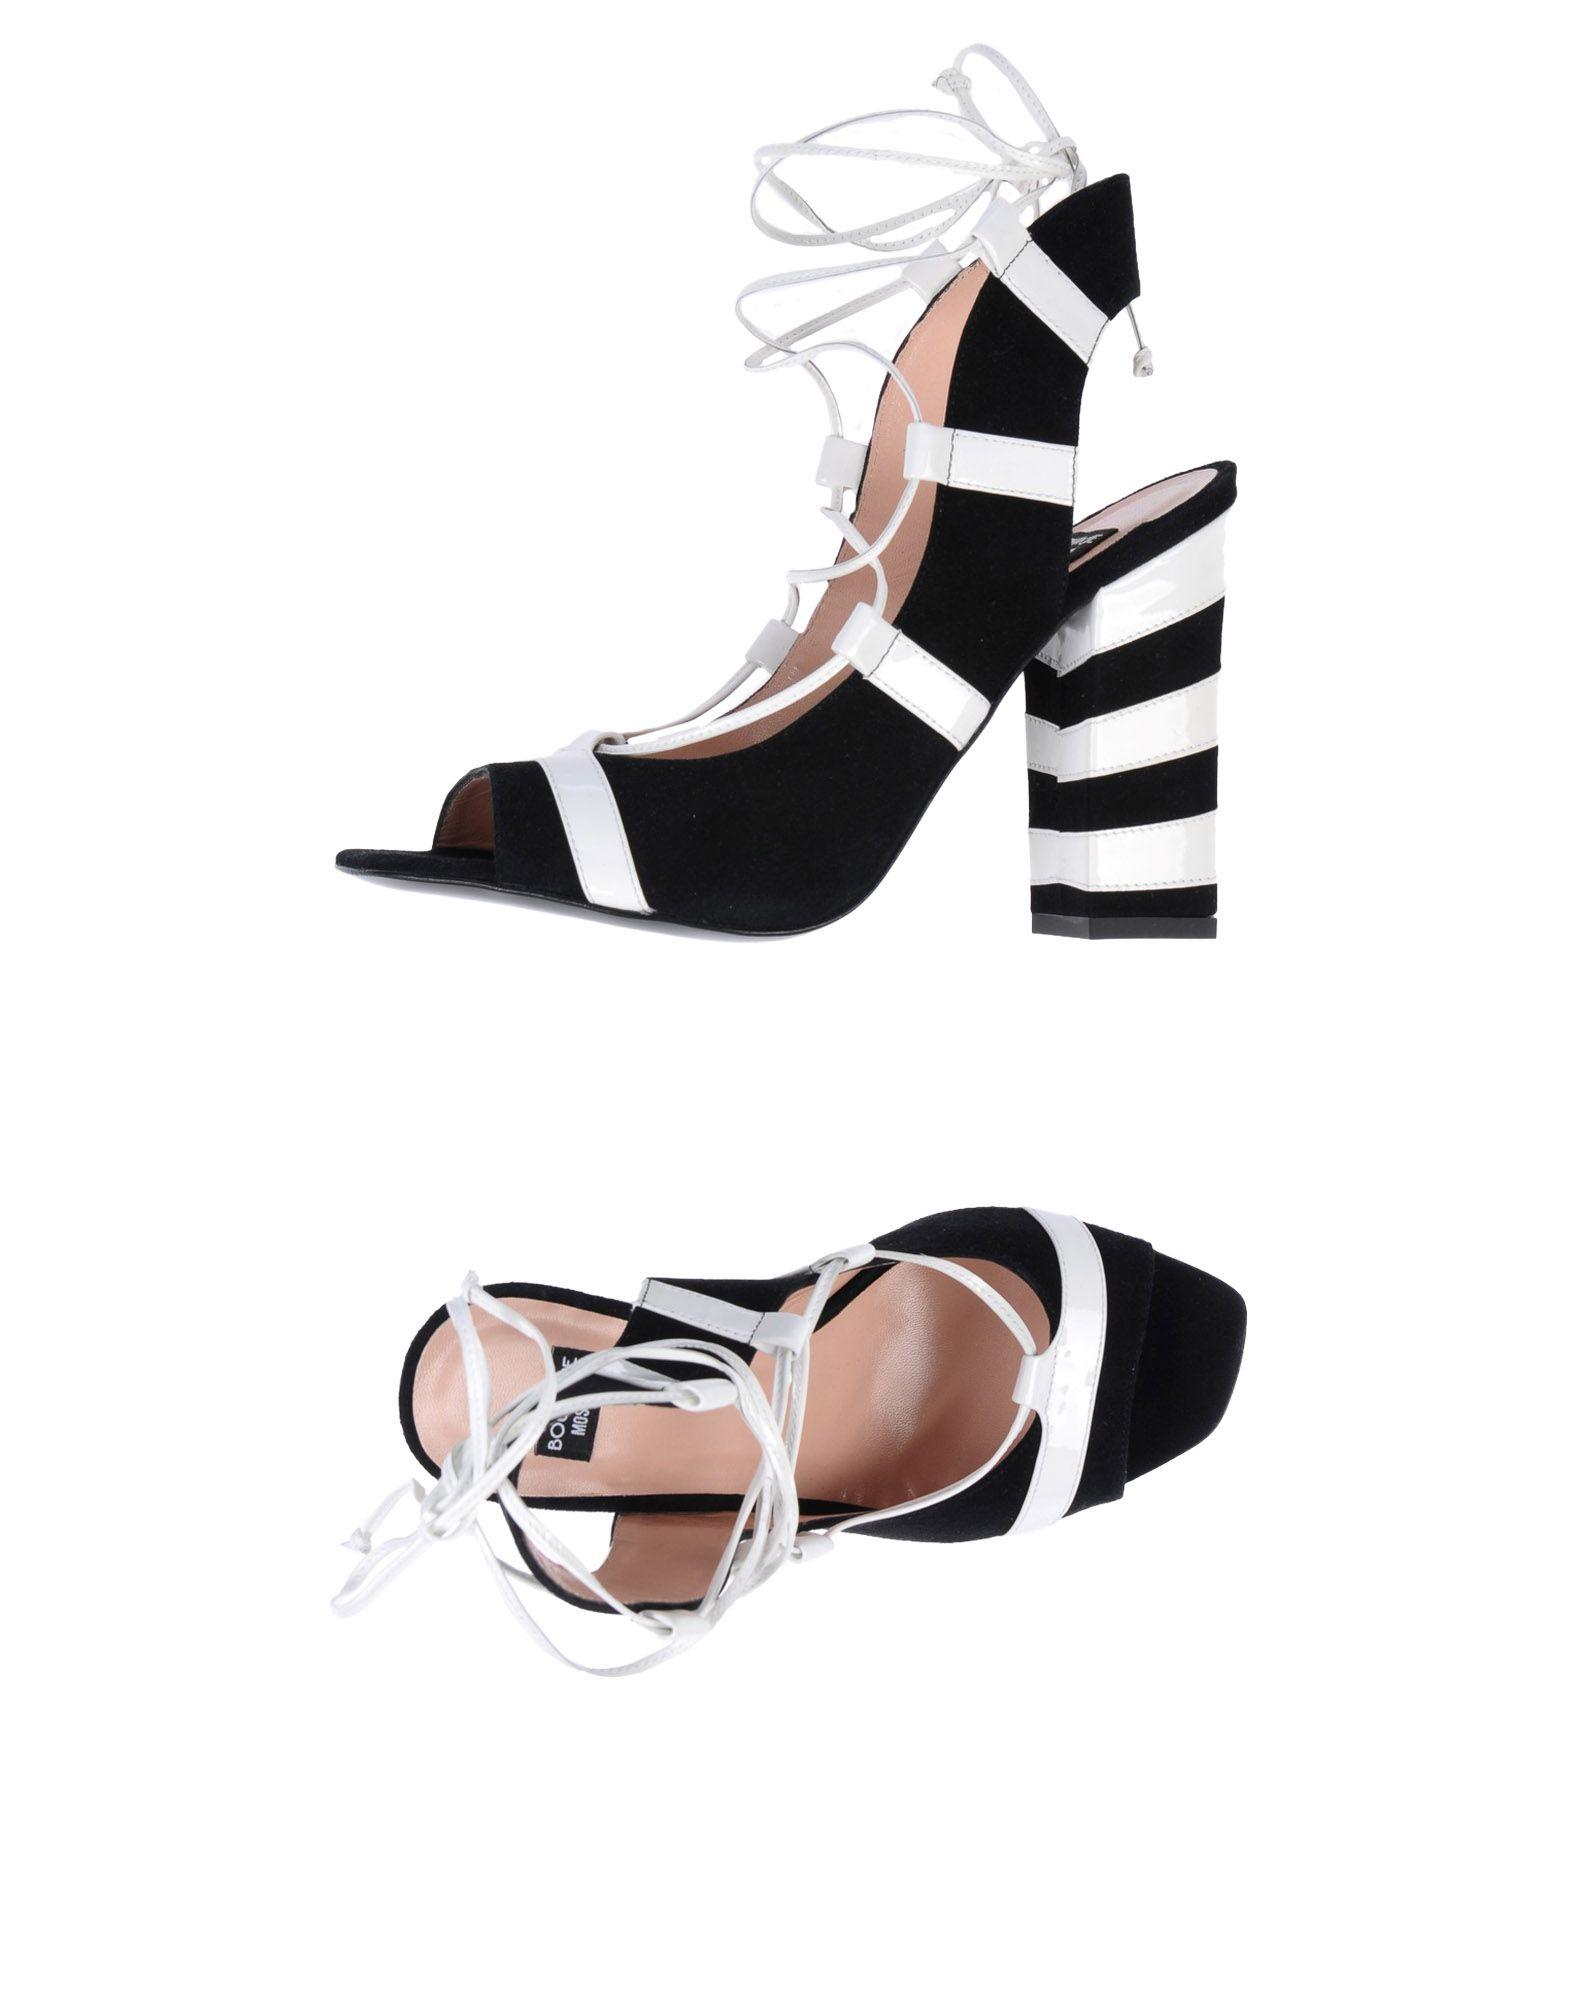 Boutique 11413355WC Moschino Sandalen Damen  11413355WC Boutique Neue Schuhe 2165cc